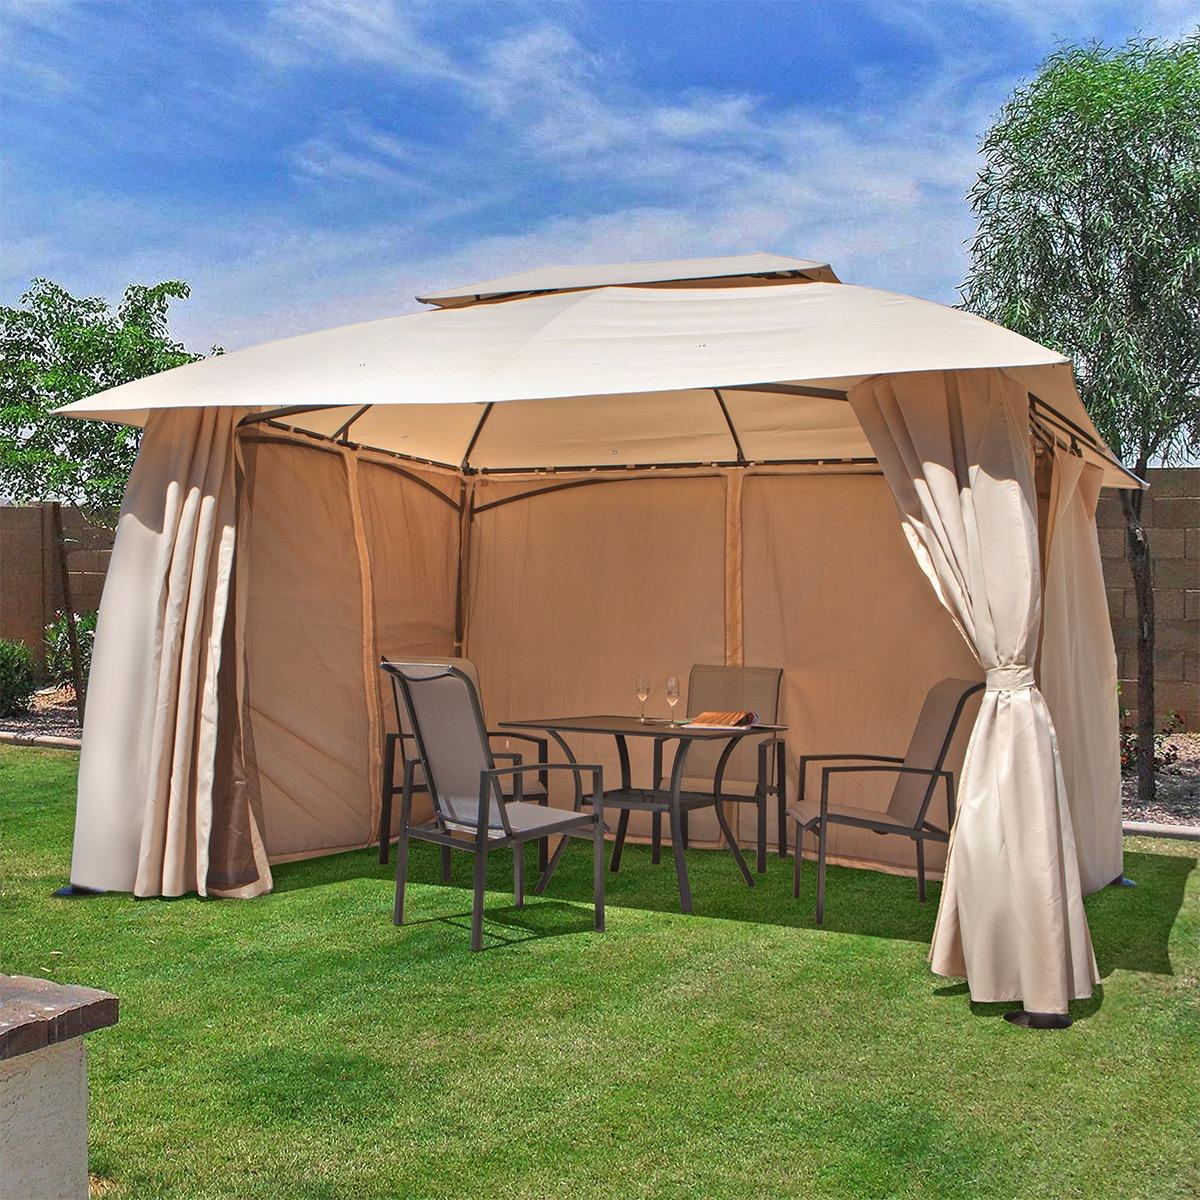 10' x 13' Outdoor Backyard Patio Gazebo Canopy Tent, with Netting